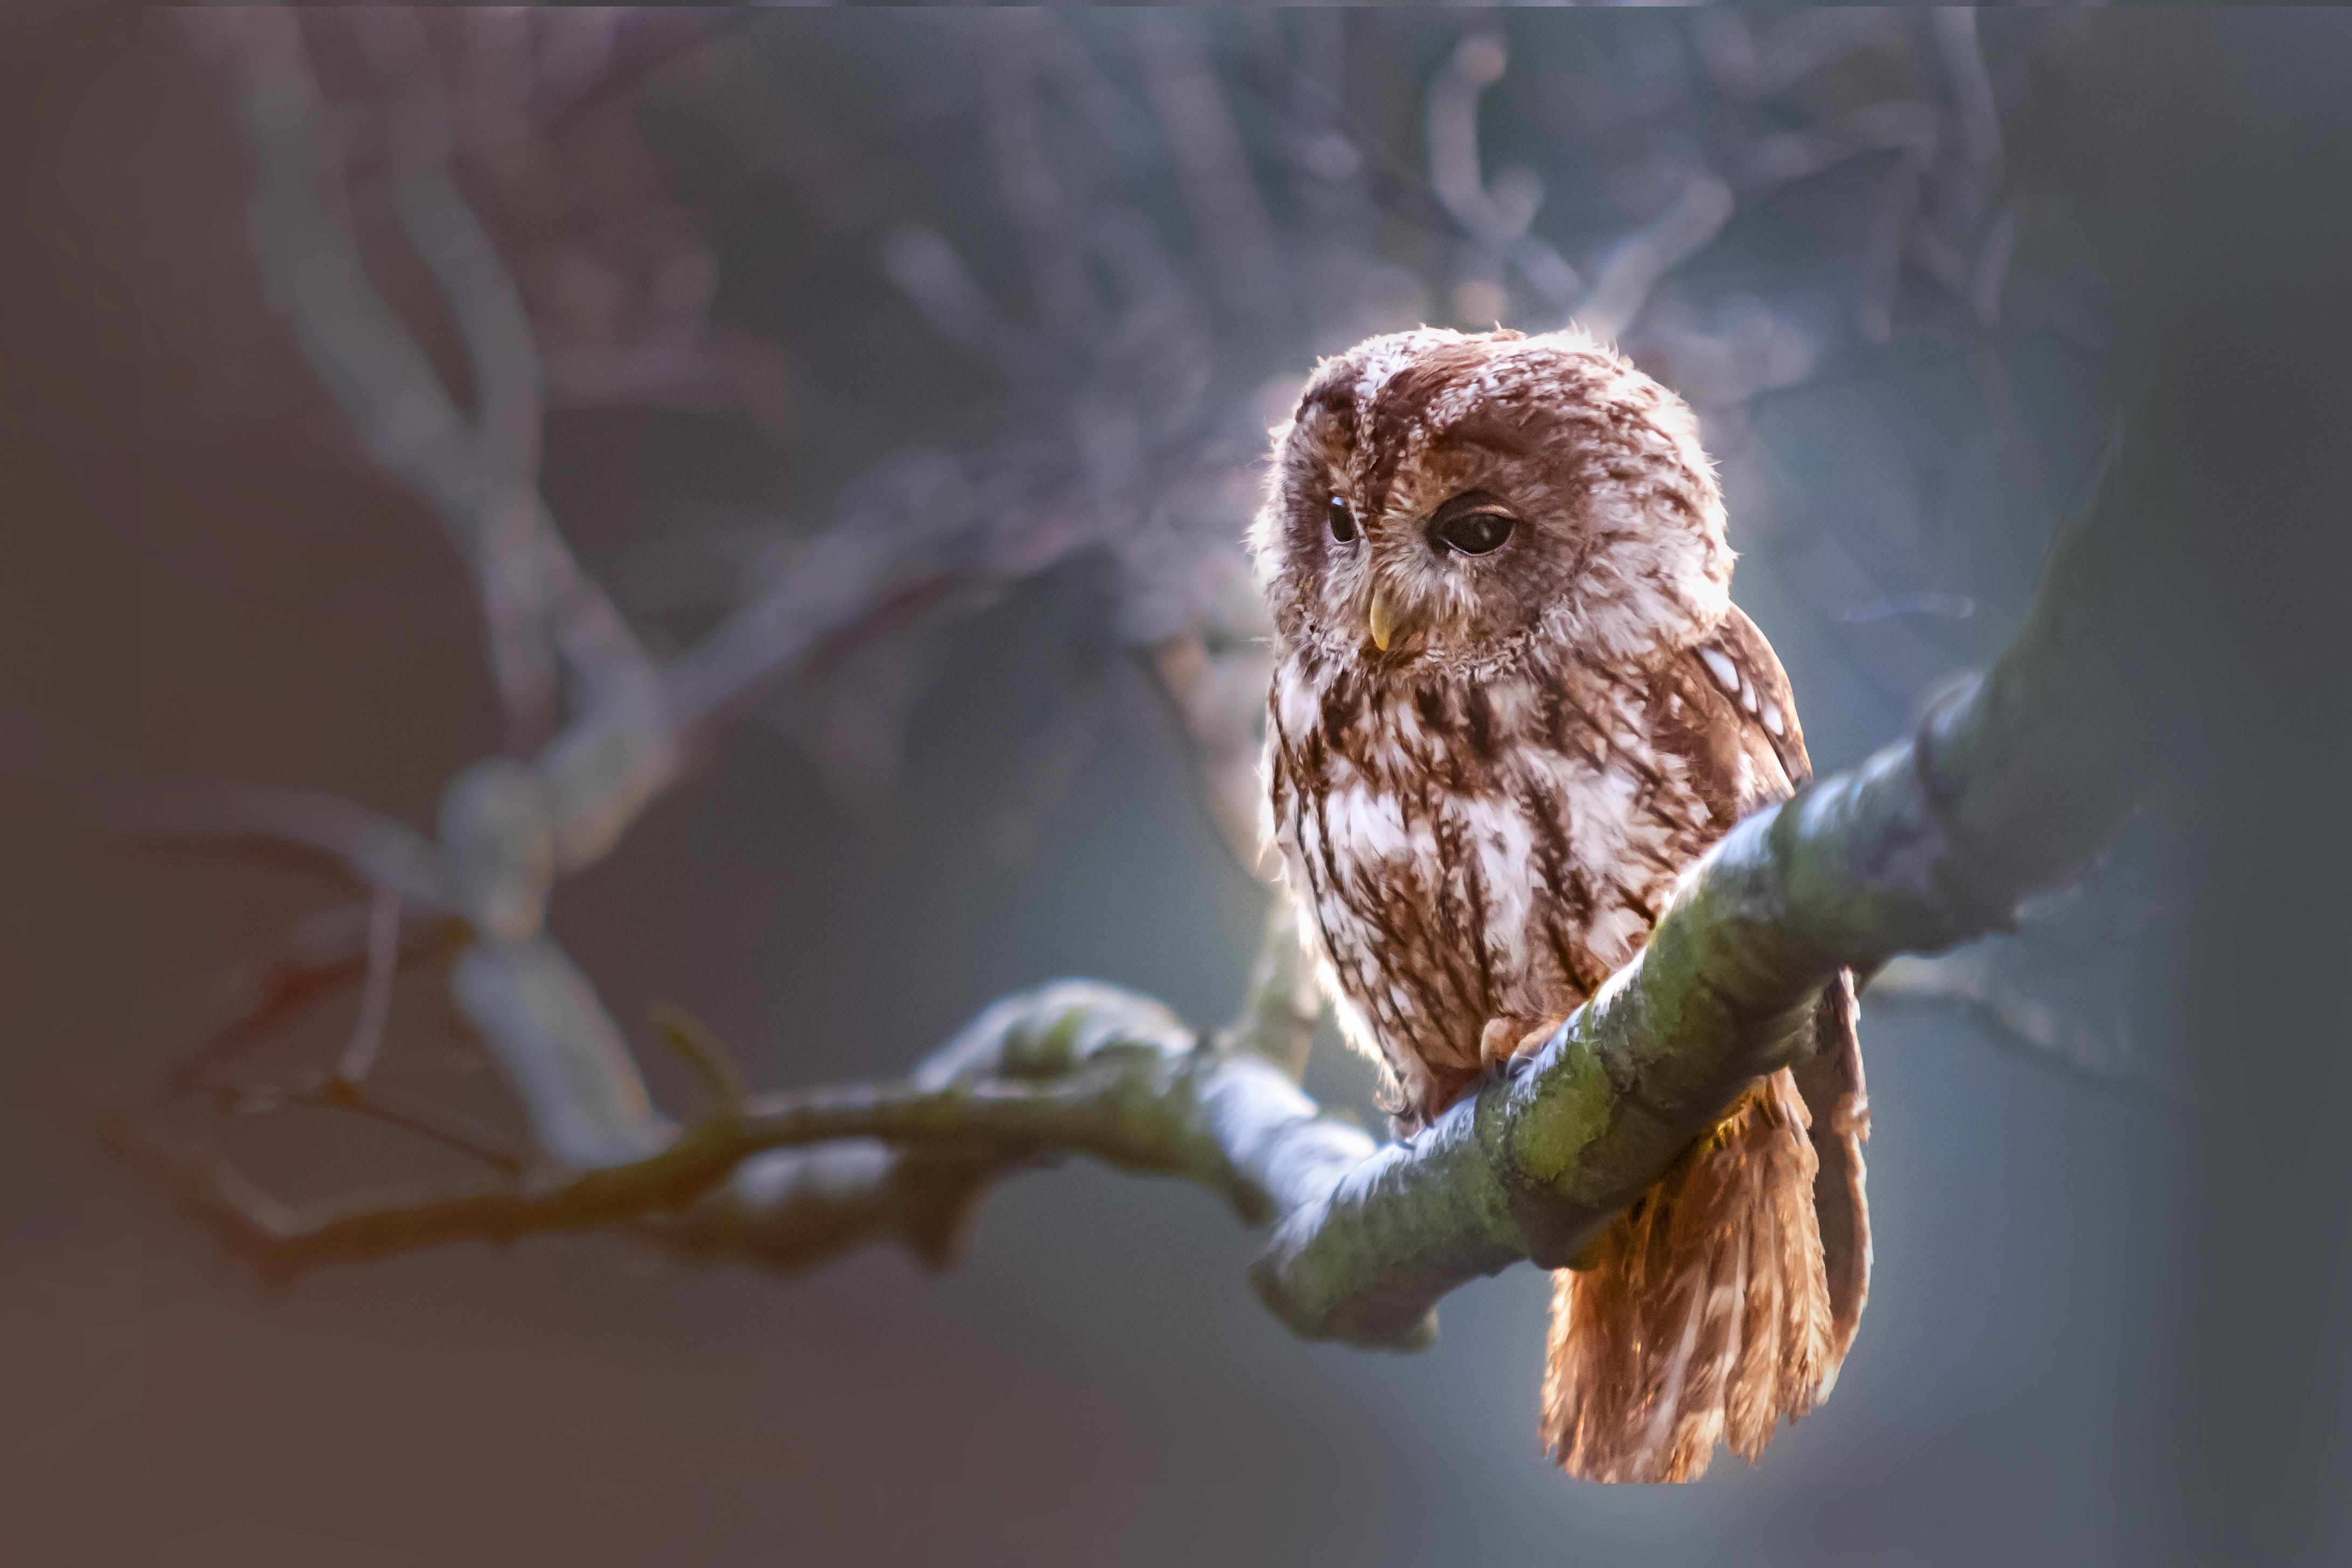 Owl 4k Ultra HD Wallpaper   Background Image   4365x2910 ...